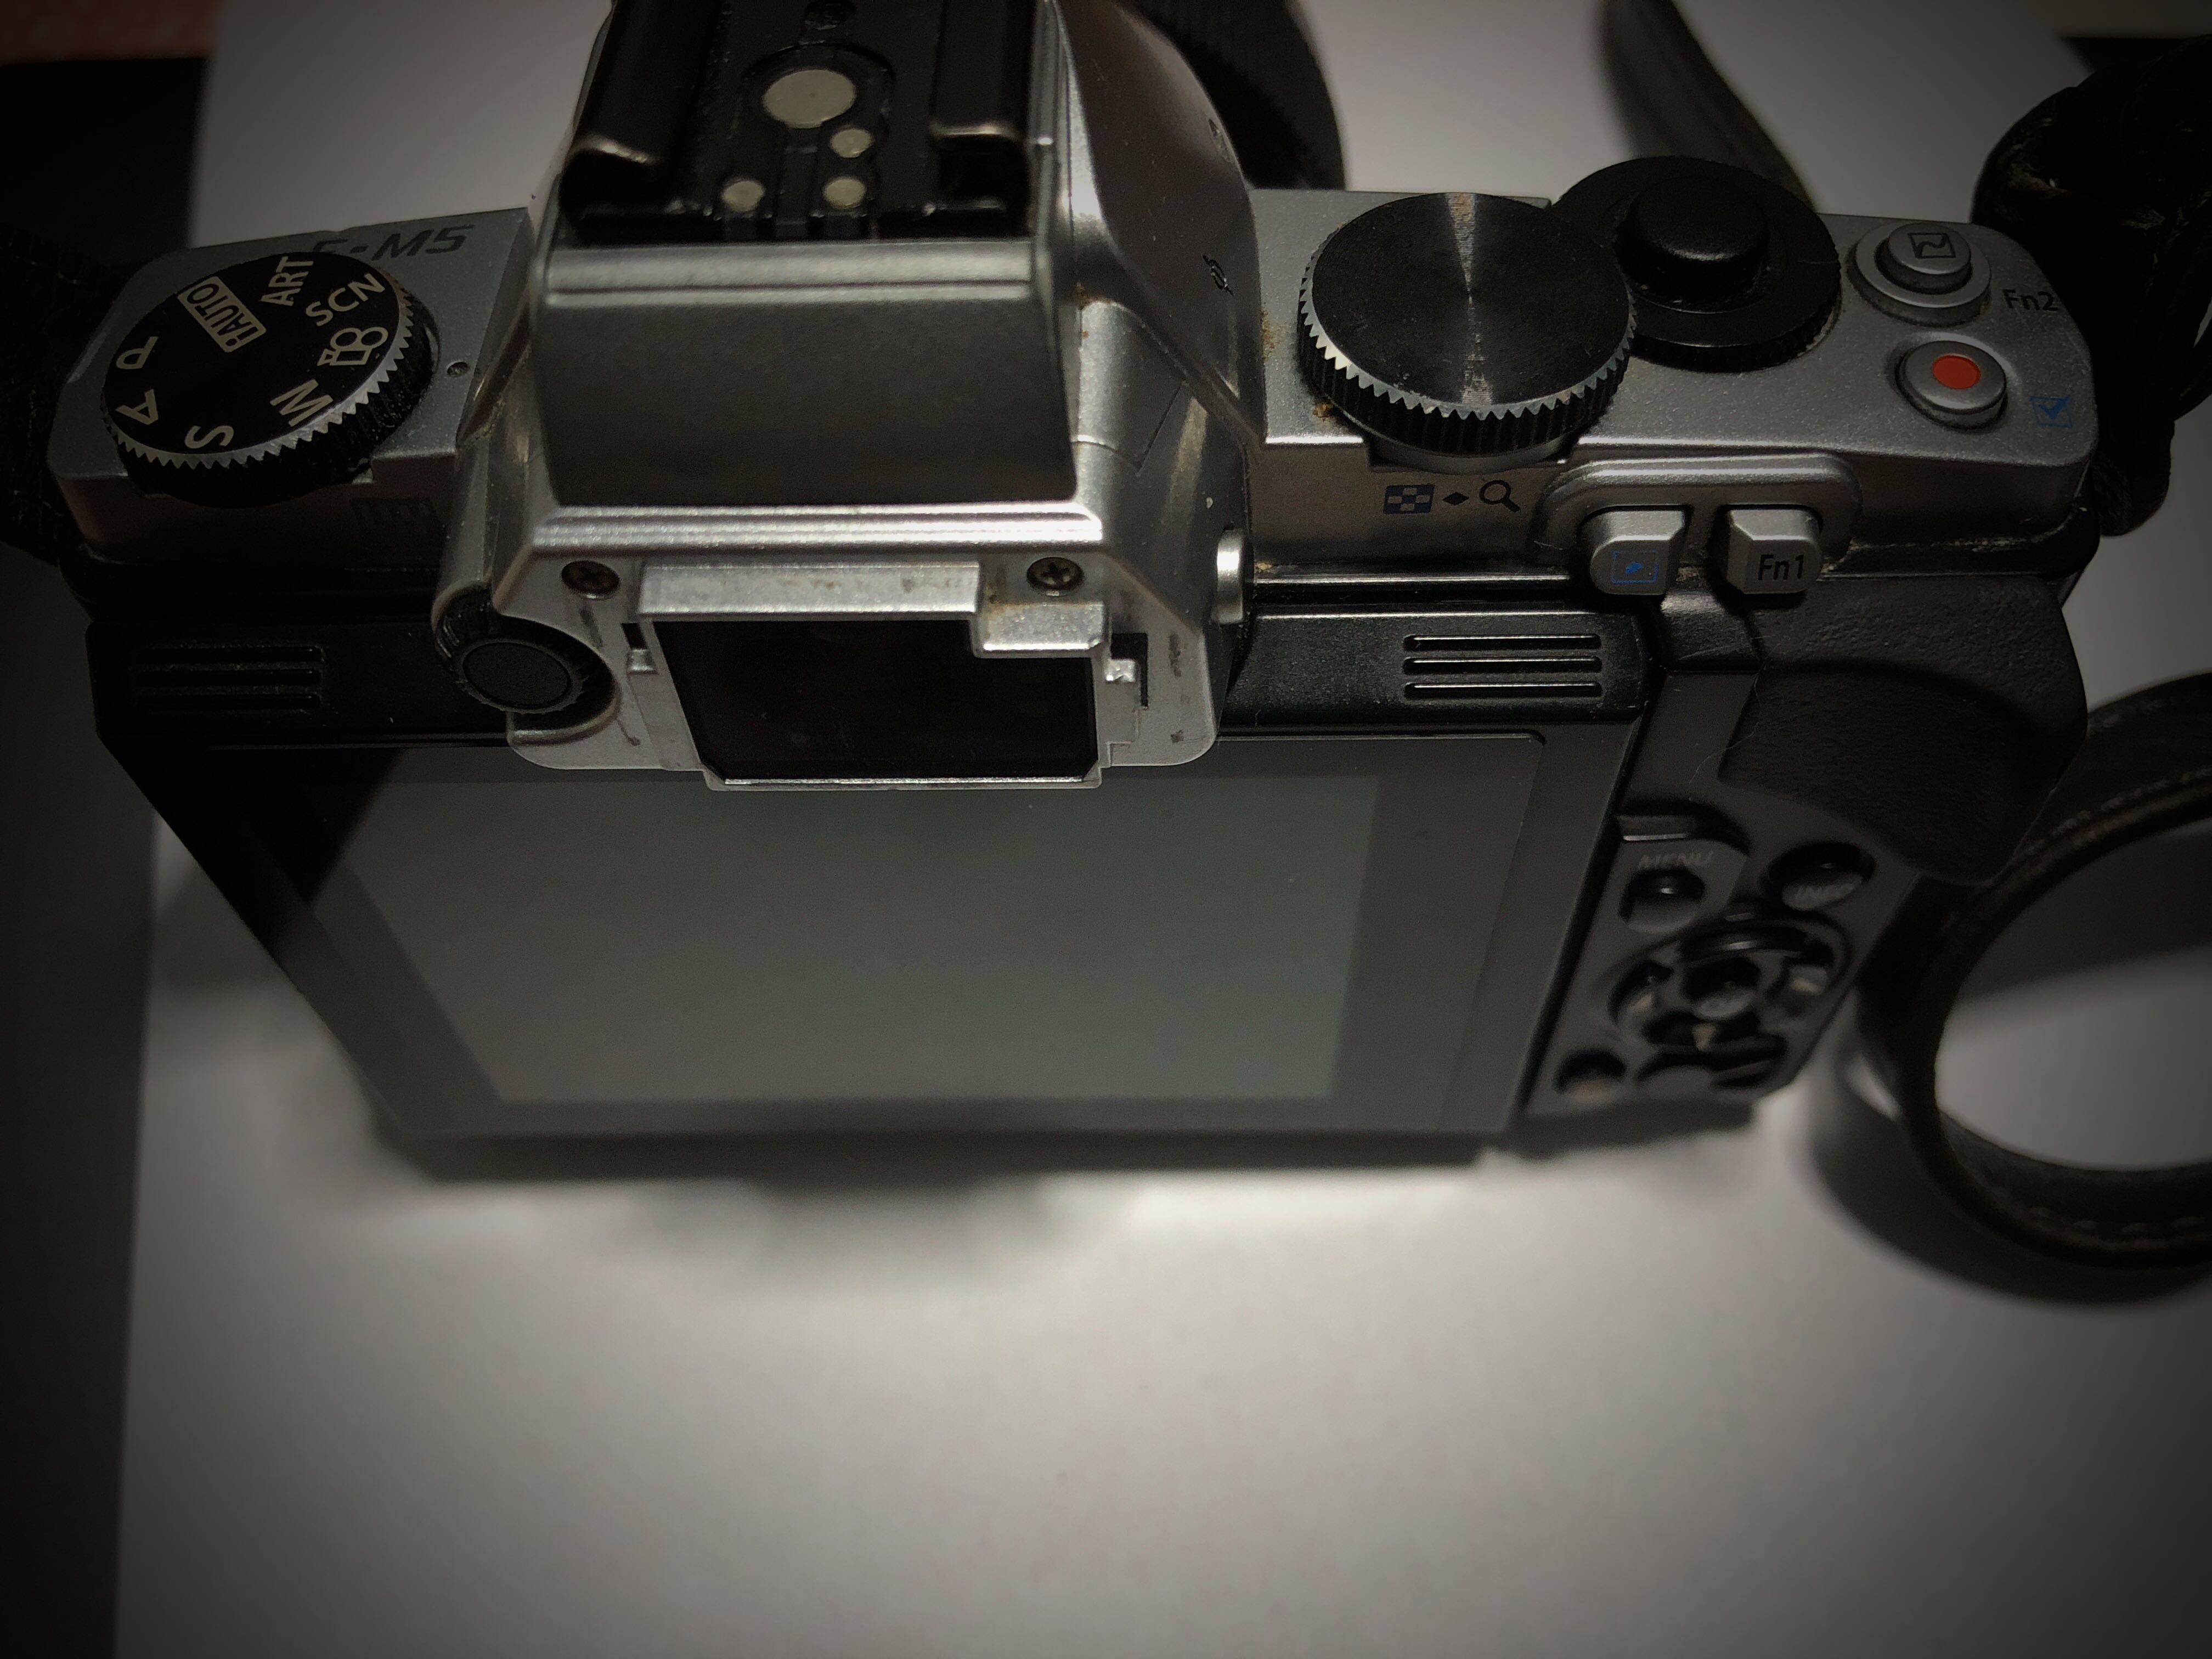 Omd Em5 Panasonic Leica 25mm F12 Photography Cameras G7 Kit 14 42 Ii Silver F Share This Listing